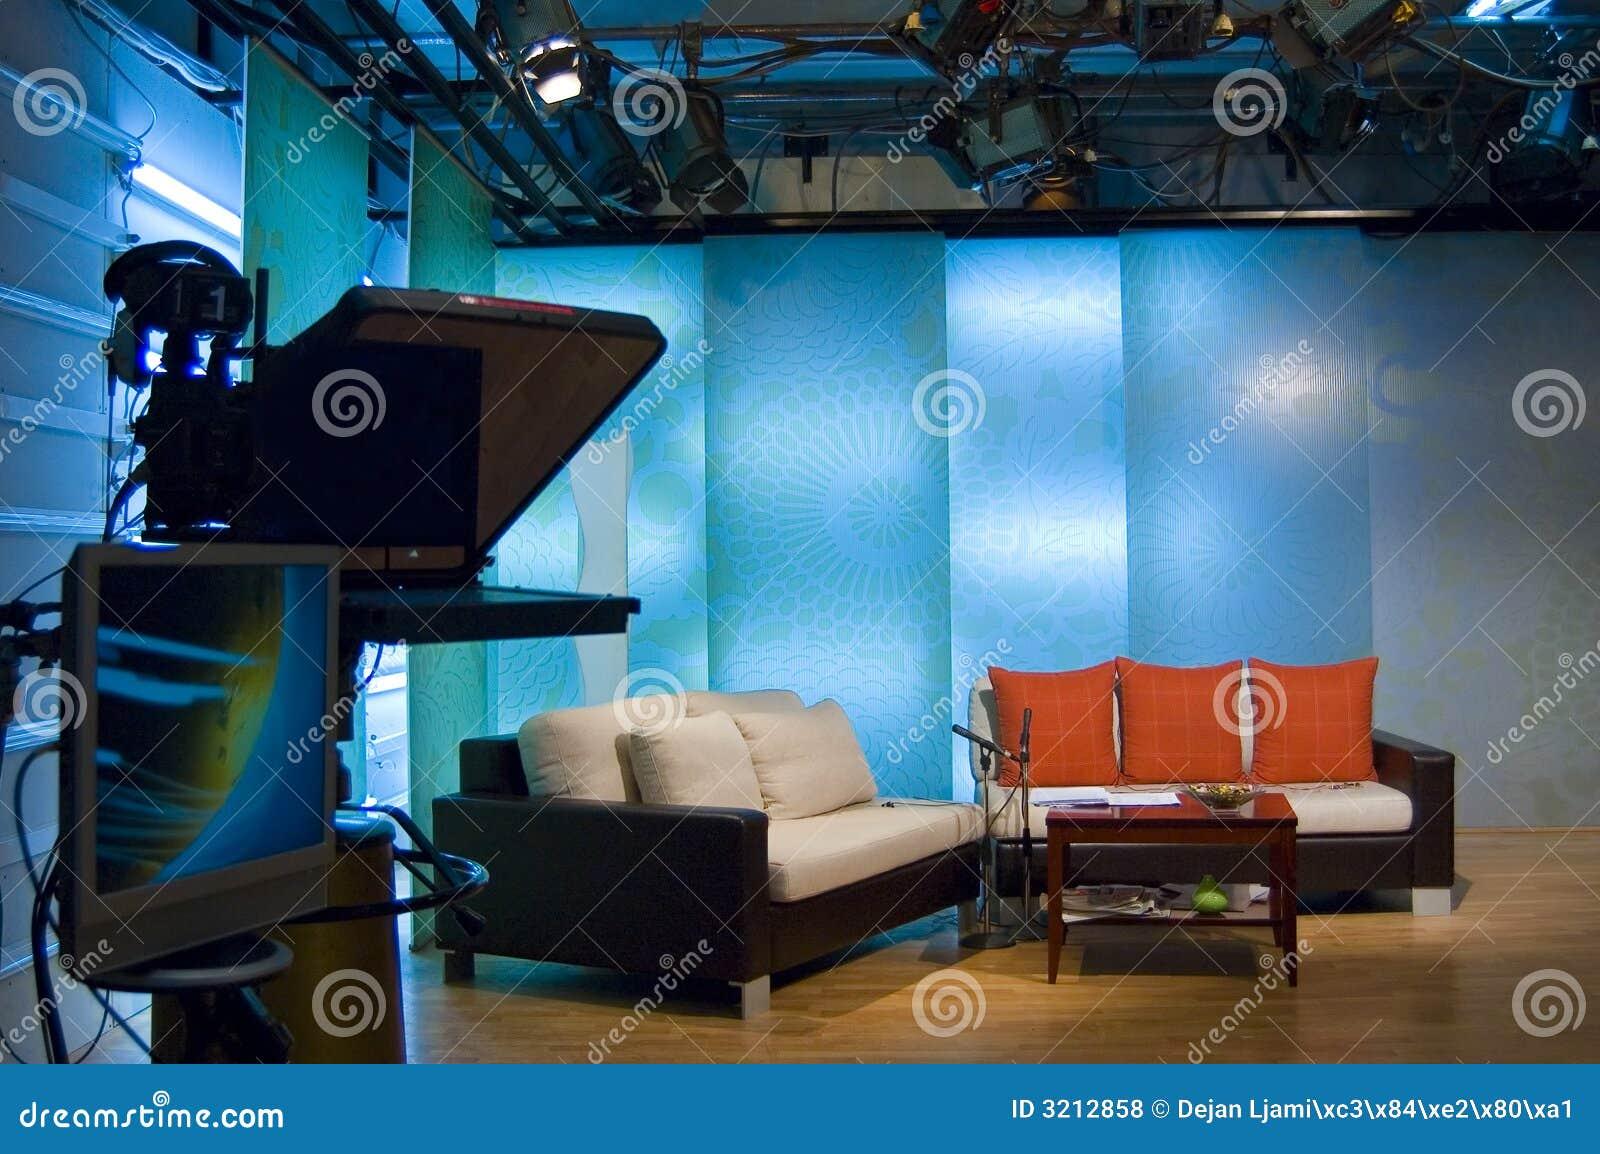 TV studio and lights